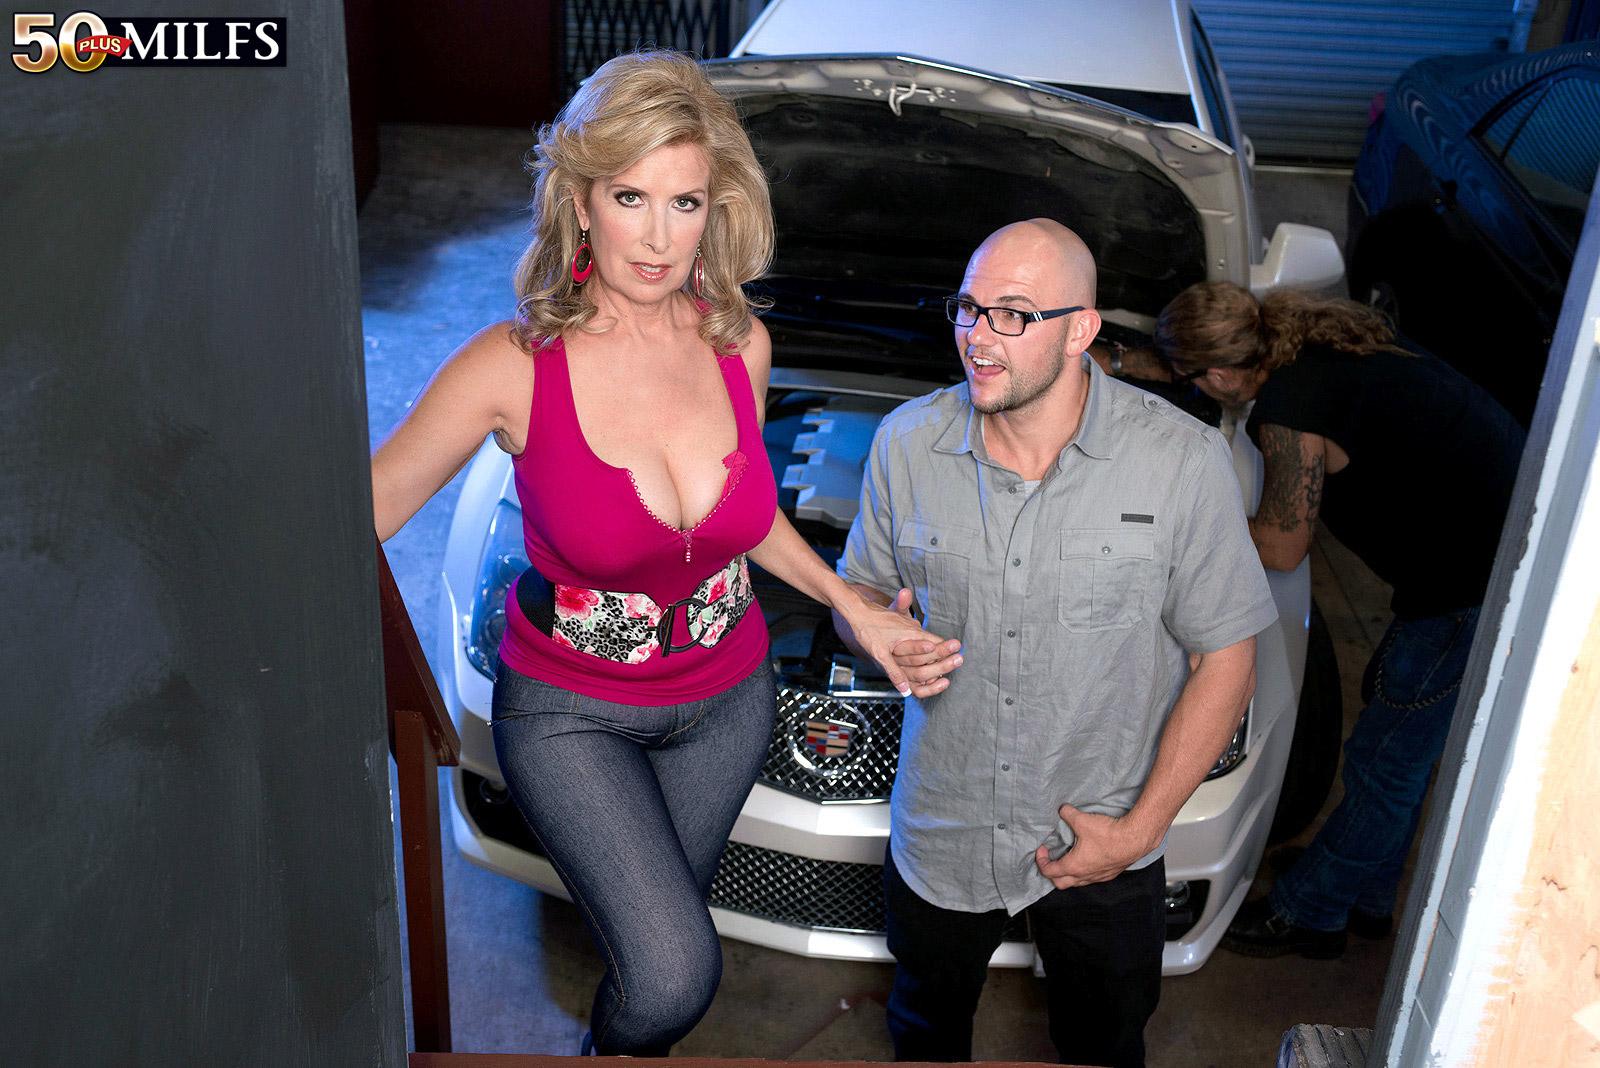 Ana beatriz barros moussy fw 2005 campaign by terry richardson mq scans,Kim Kardashian Body Adult archive Kirsten dunst paparazzi,CelebGate Aly Michalka See Through